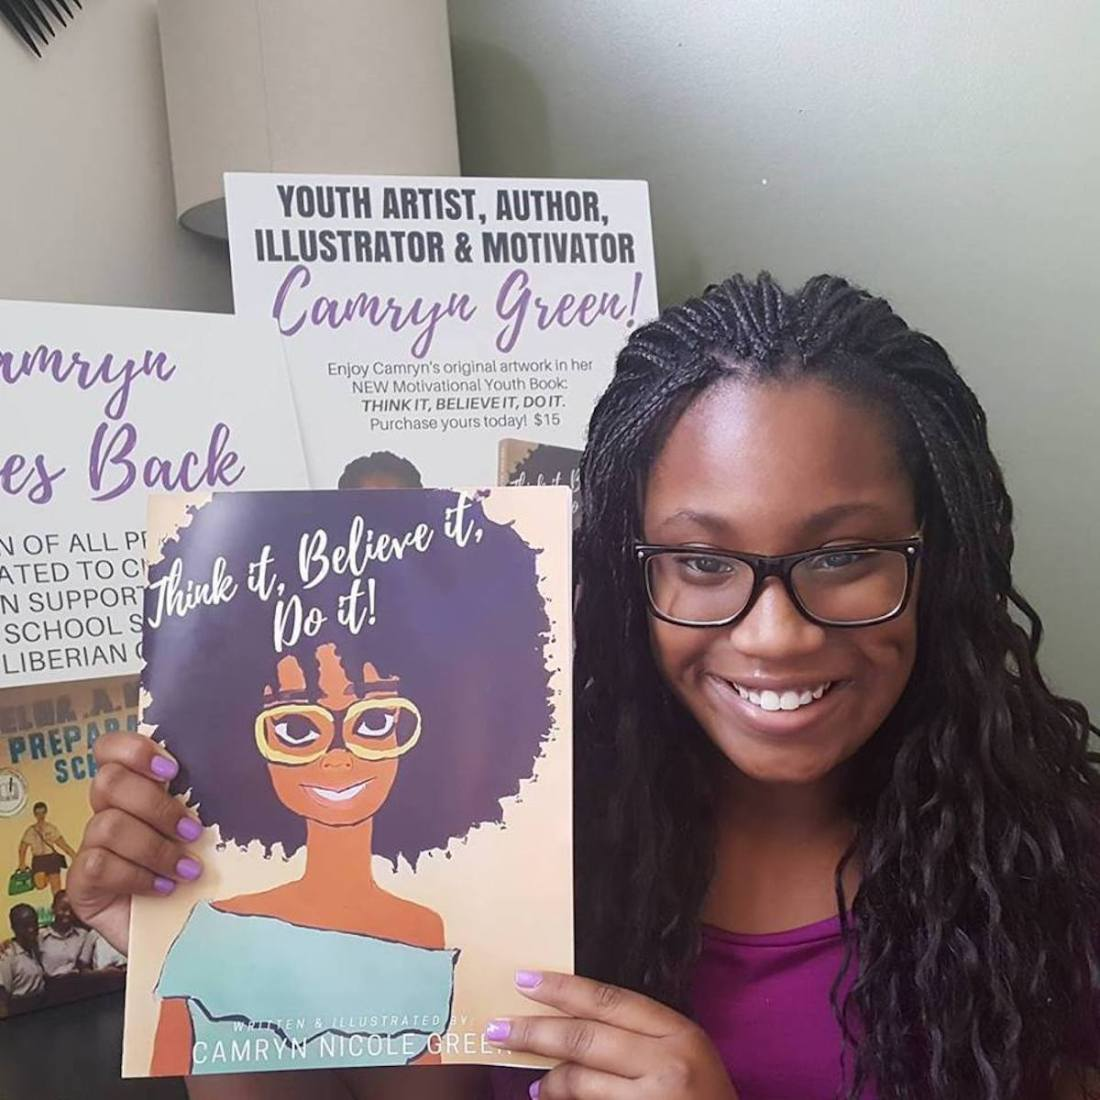 Camryn Green, African American Art, Black Art, African American Literature, Black Literature, KOLUMN Magazine, KOLUMN, KINDR'D Magazine, KINDR'D, Willoughby Avenue